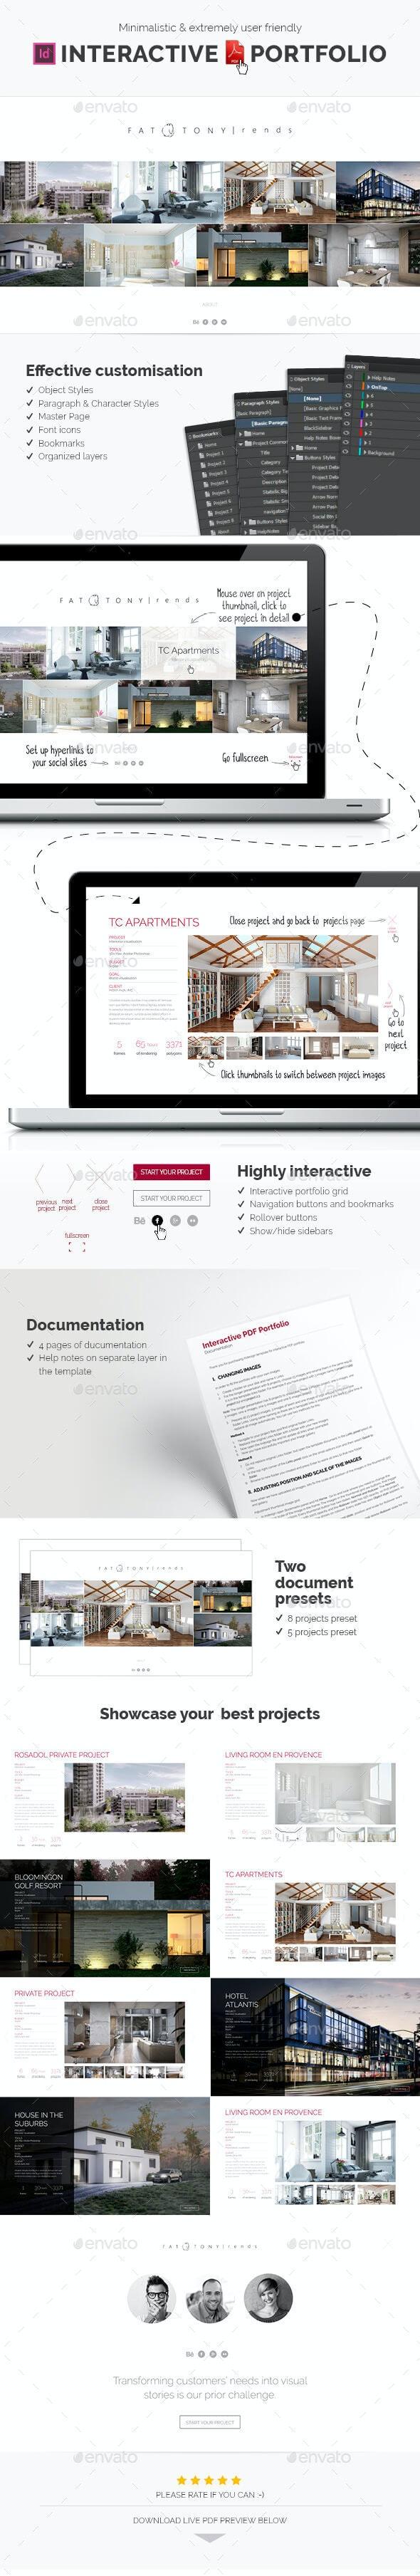 Interactive PDF portfolio by Scopplum | GraphicRiver